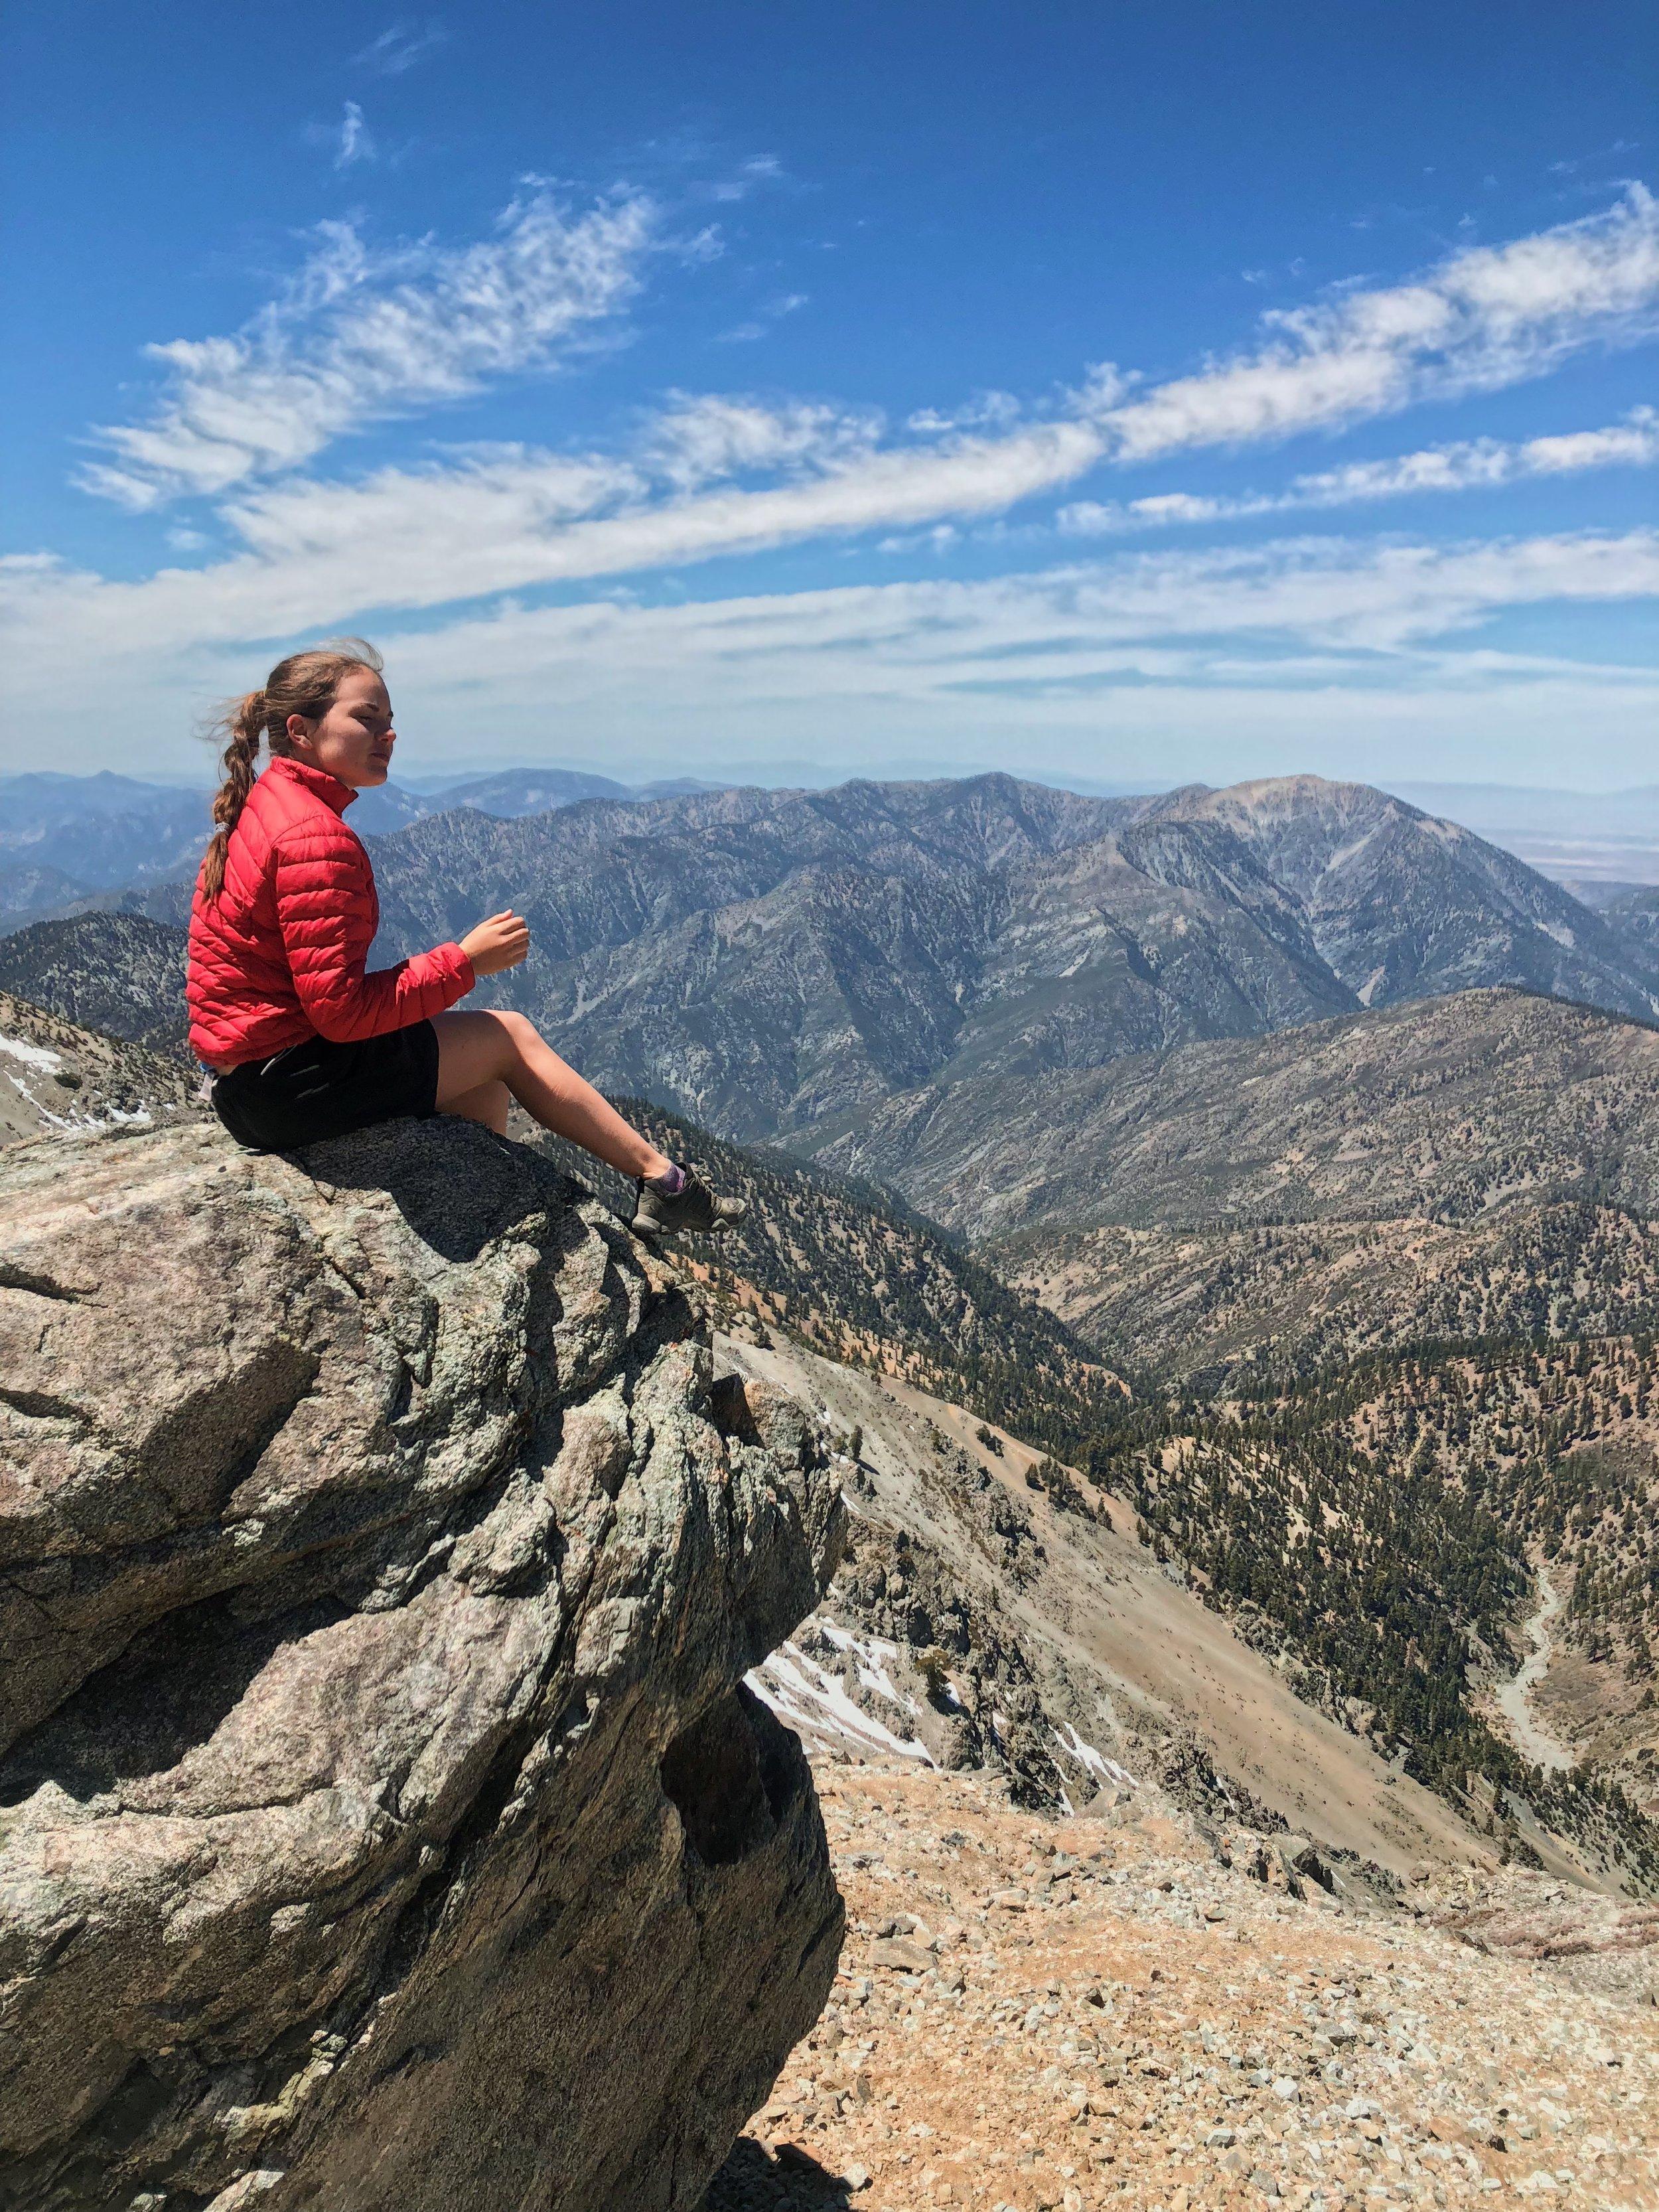 TRIP LEAD: Catherine Atkinson - Baldy climber extraordinaireContact Catherine: atkinsoc@usc.eduRead Catherine's bio here.